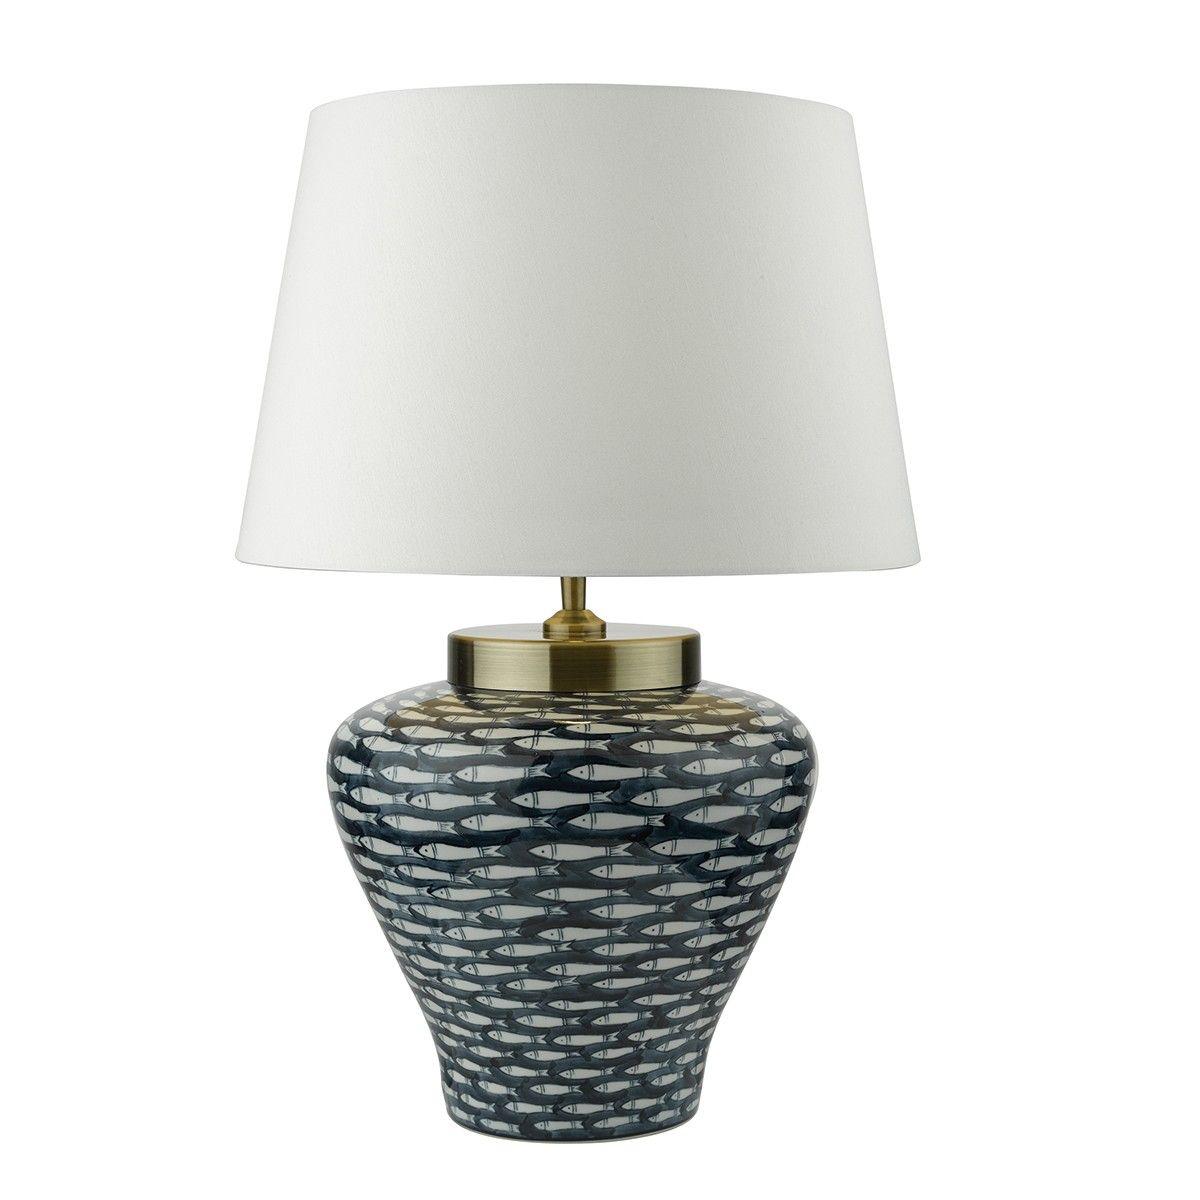 Porcelain Table Lamp Base Hand Finished